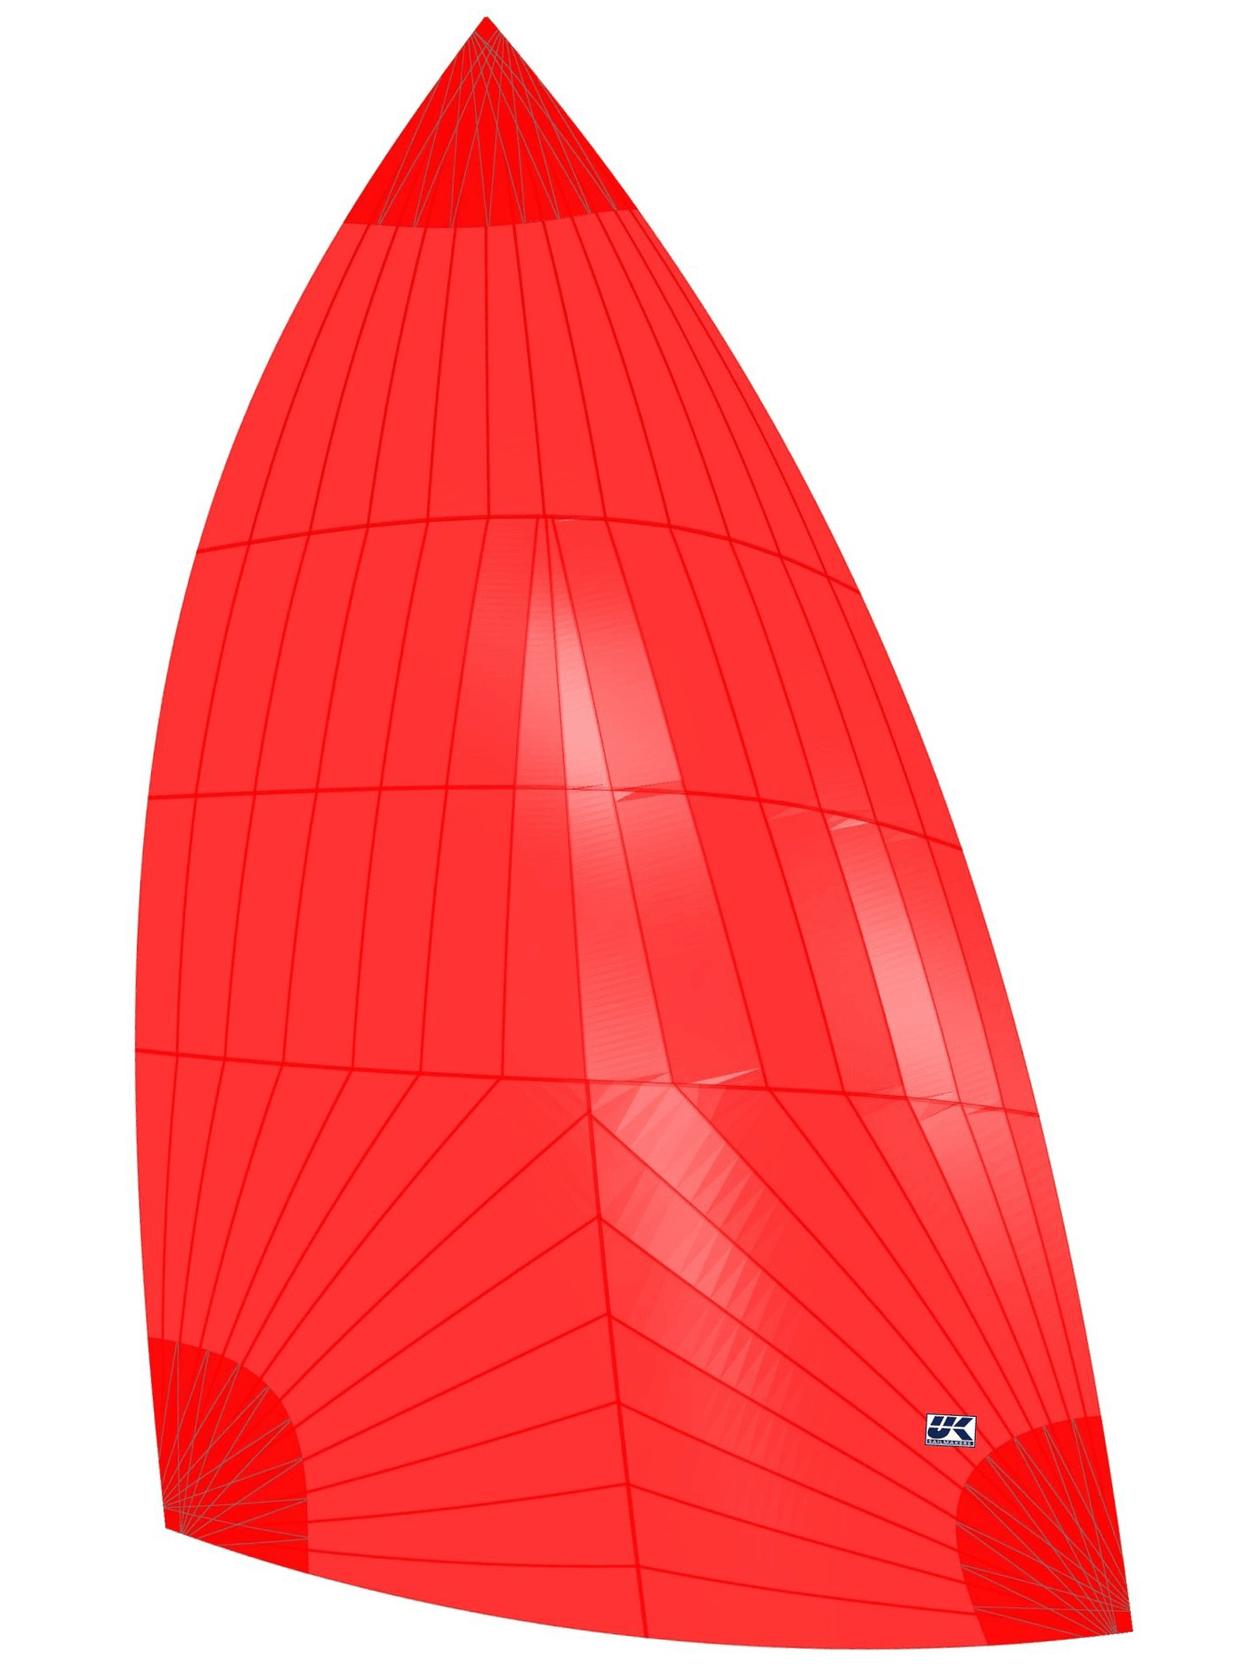 UK Sailmakers Cruising Spinnaker Code Zero Point Five